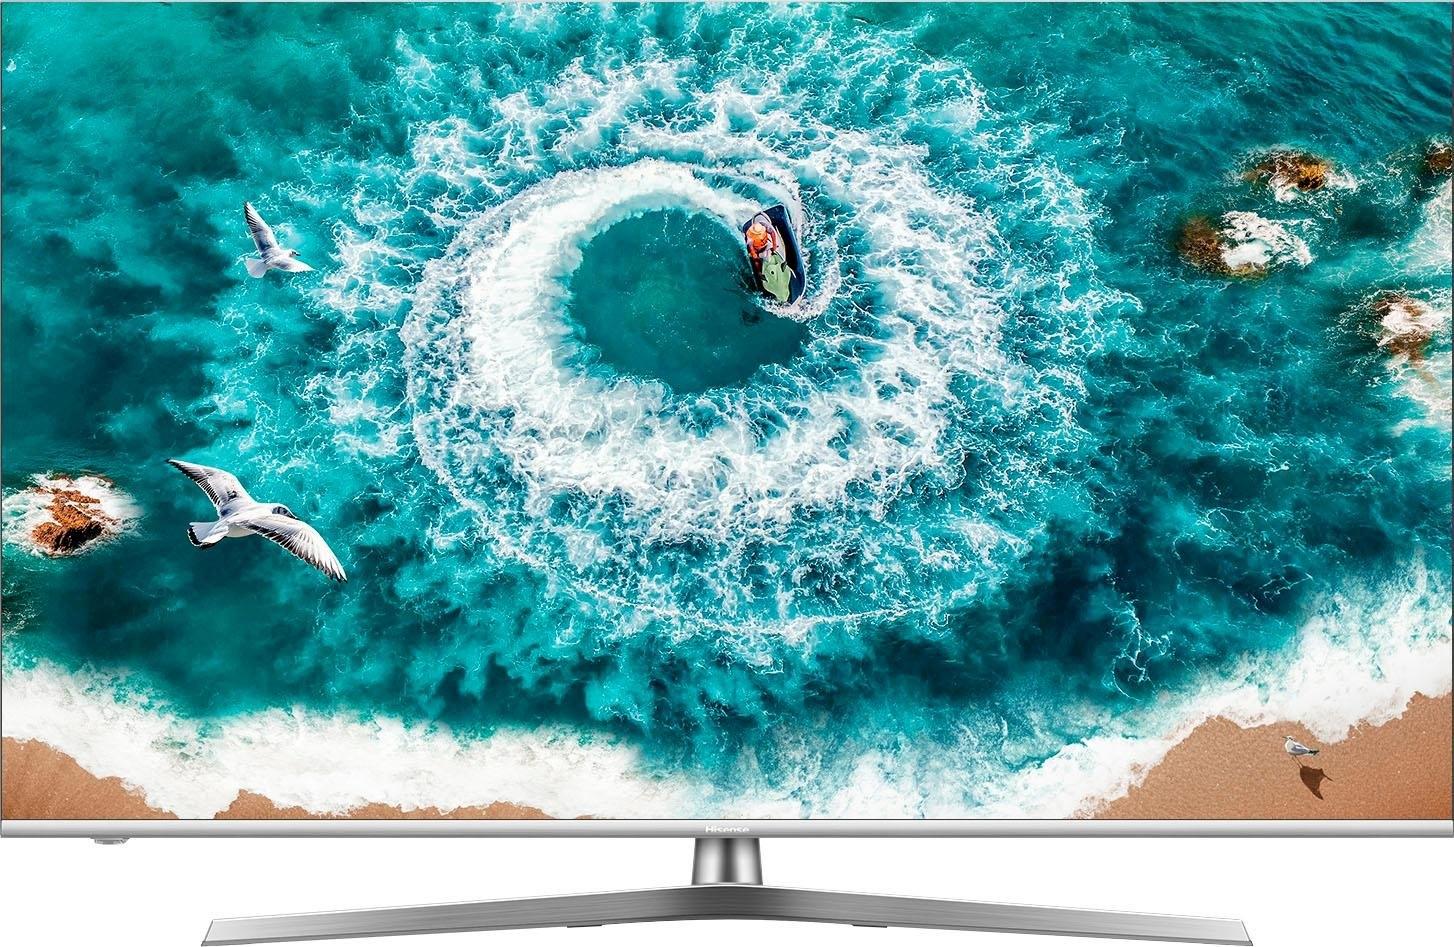 Hisense H65U8B led-tv (163 cm / 65 inch), 4K Ultra HD, smart-tv nu online kopen bij OTTO